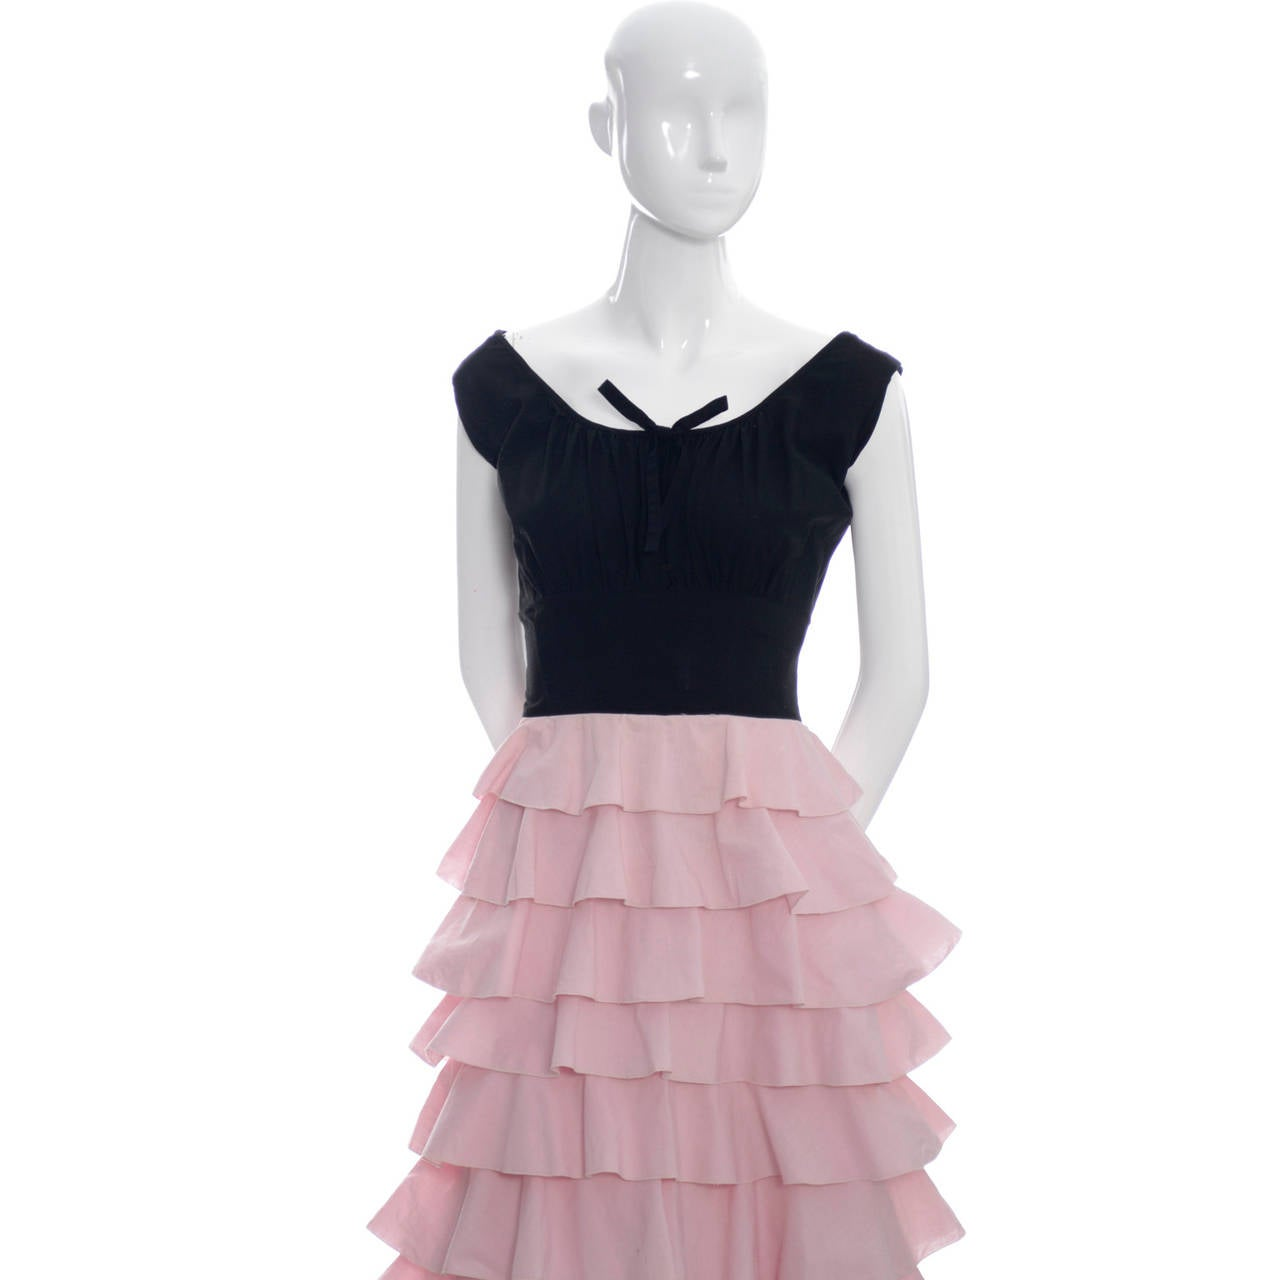 1940s Vintage Gilbert Adrian Original Dress Pink Ruffles Rare Designer Gown For Sale 2